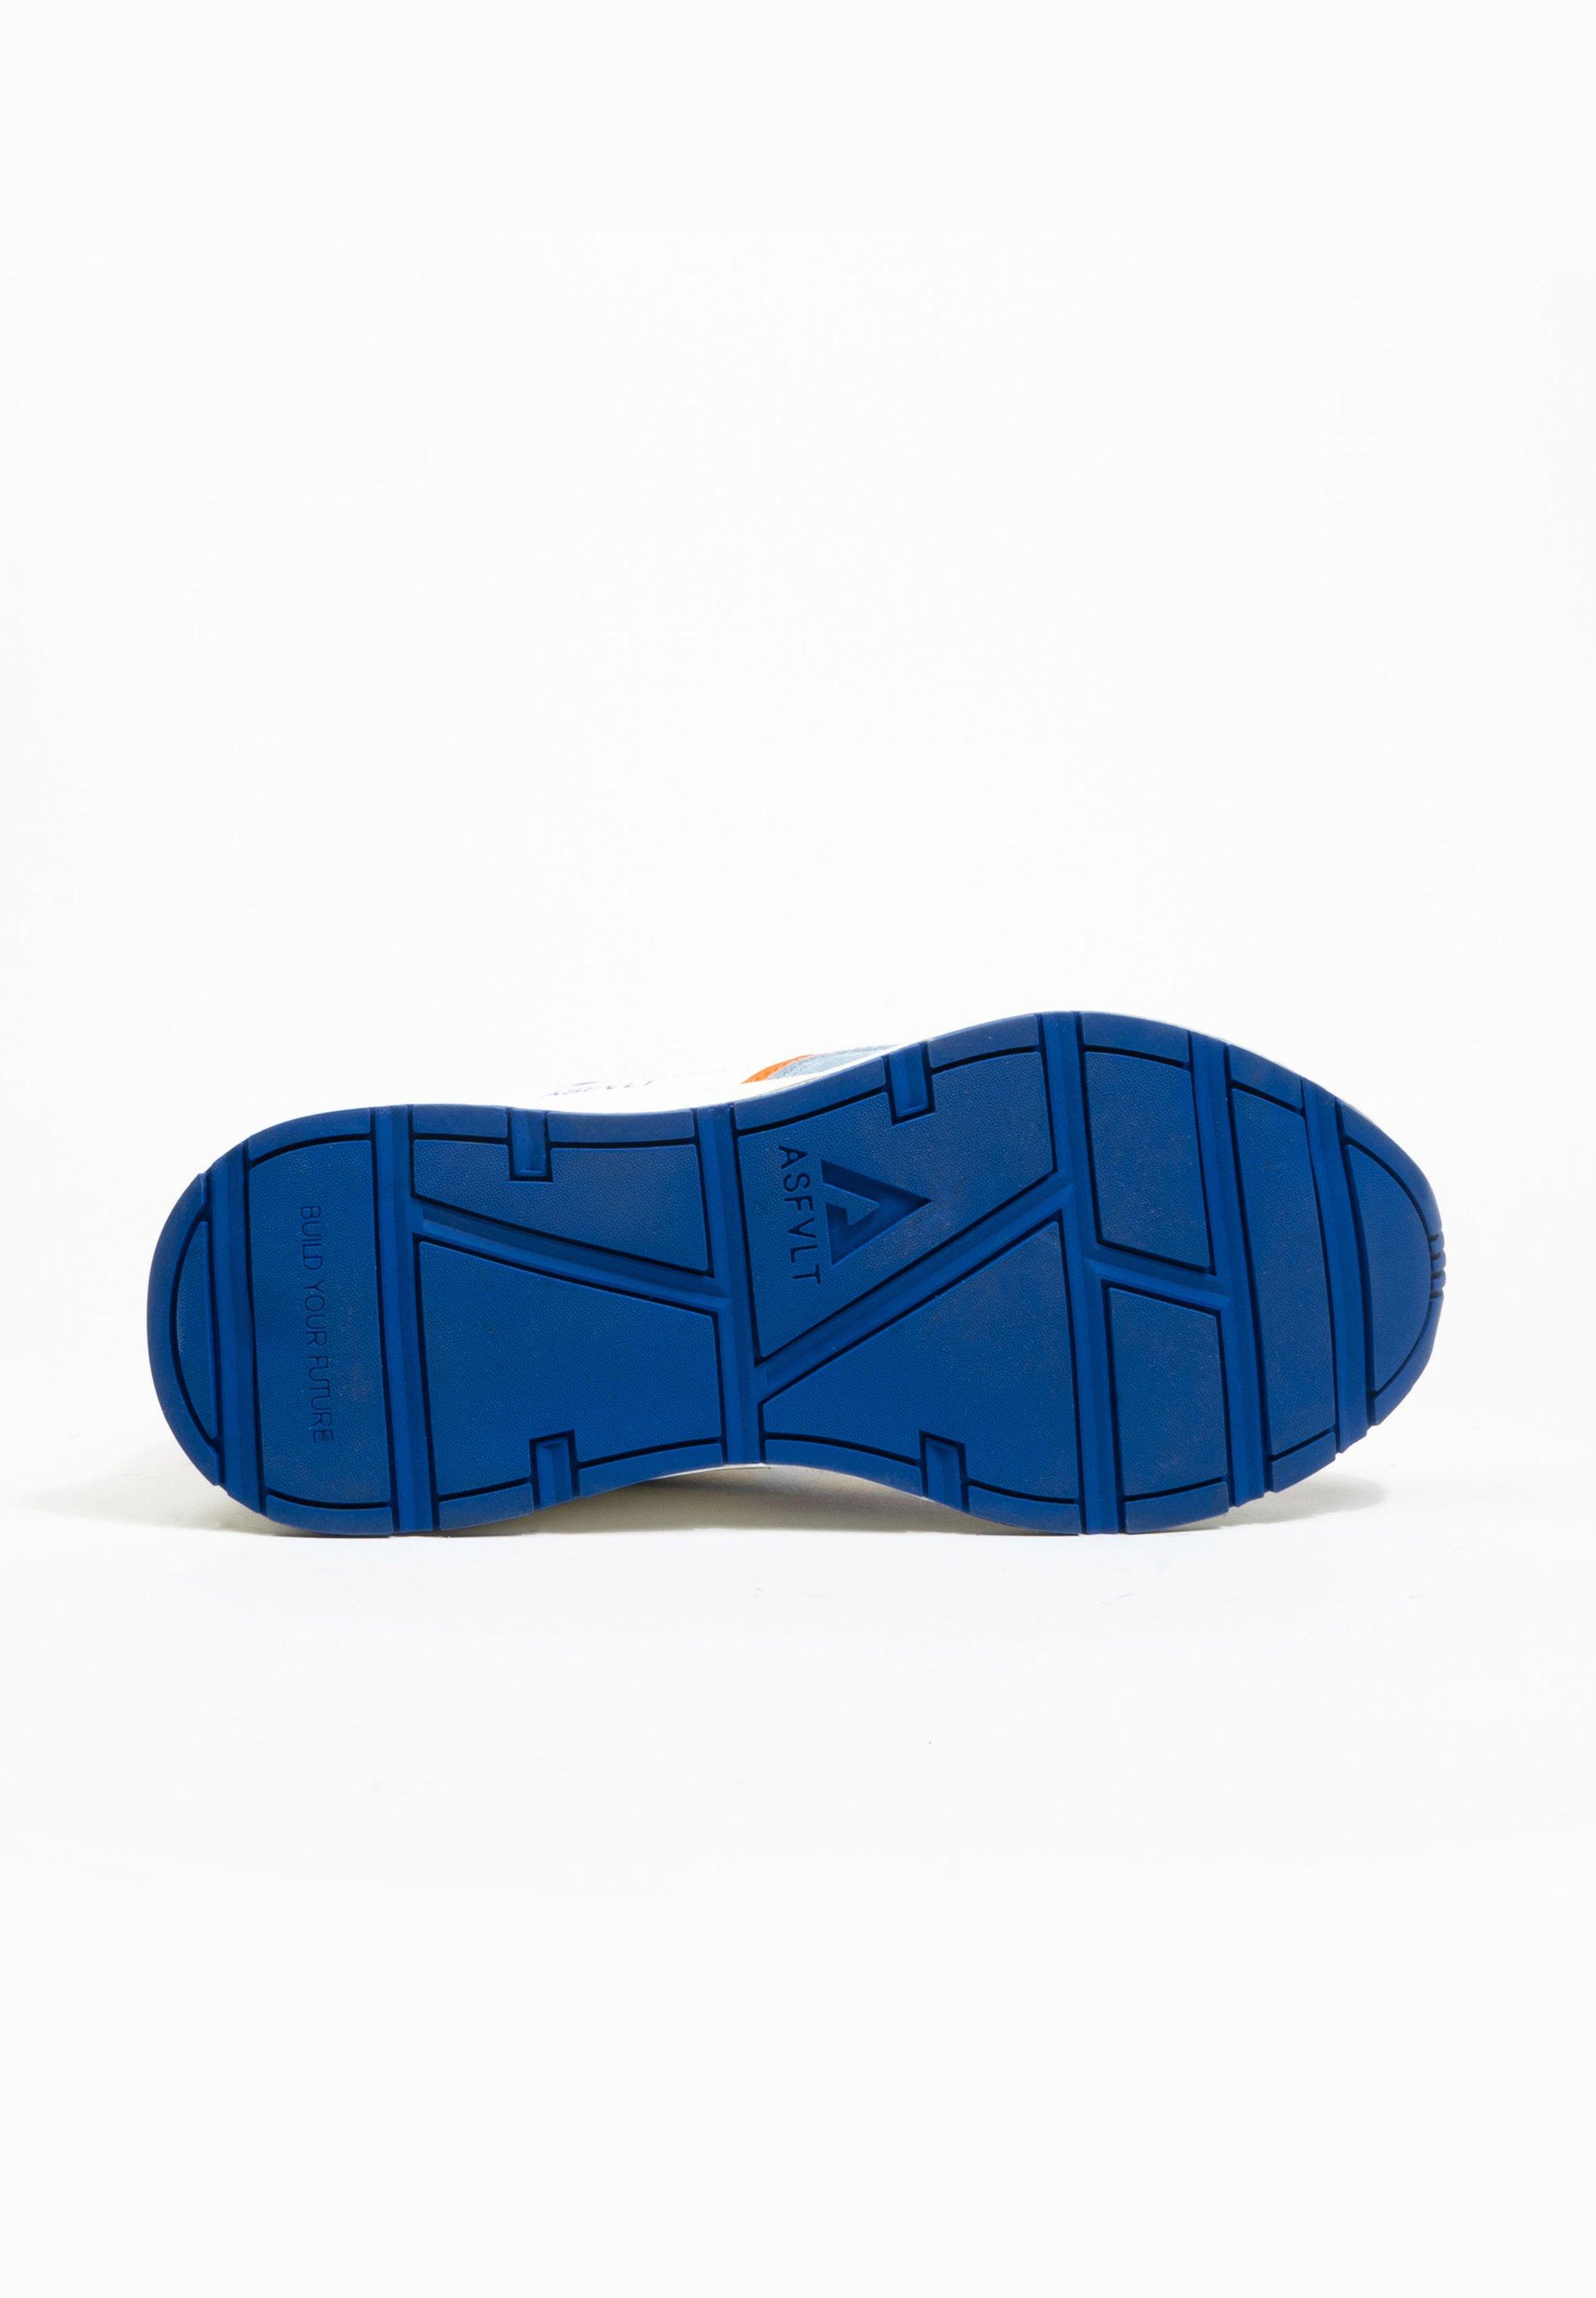 ASFVLT Sneaker low - hyterical/mehrfarbig - Herrenschuhe eYwYn